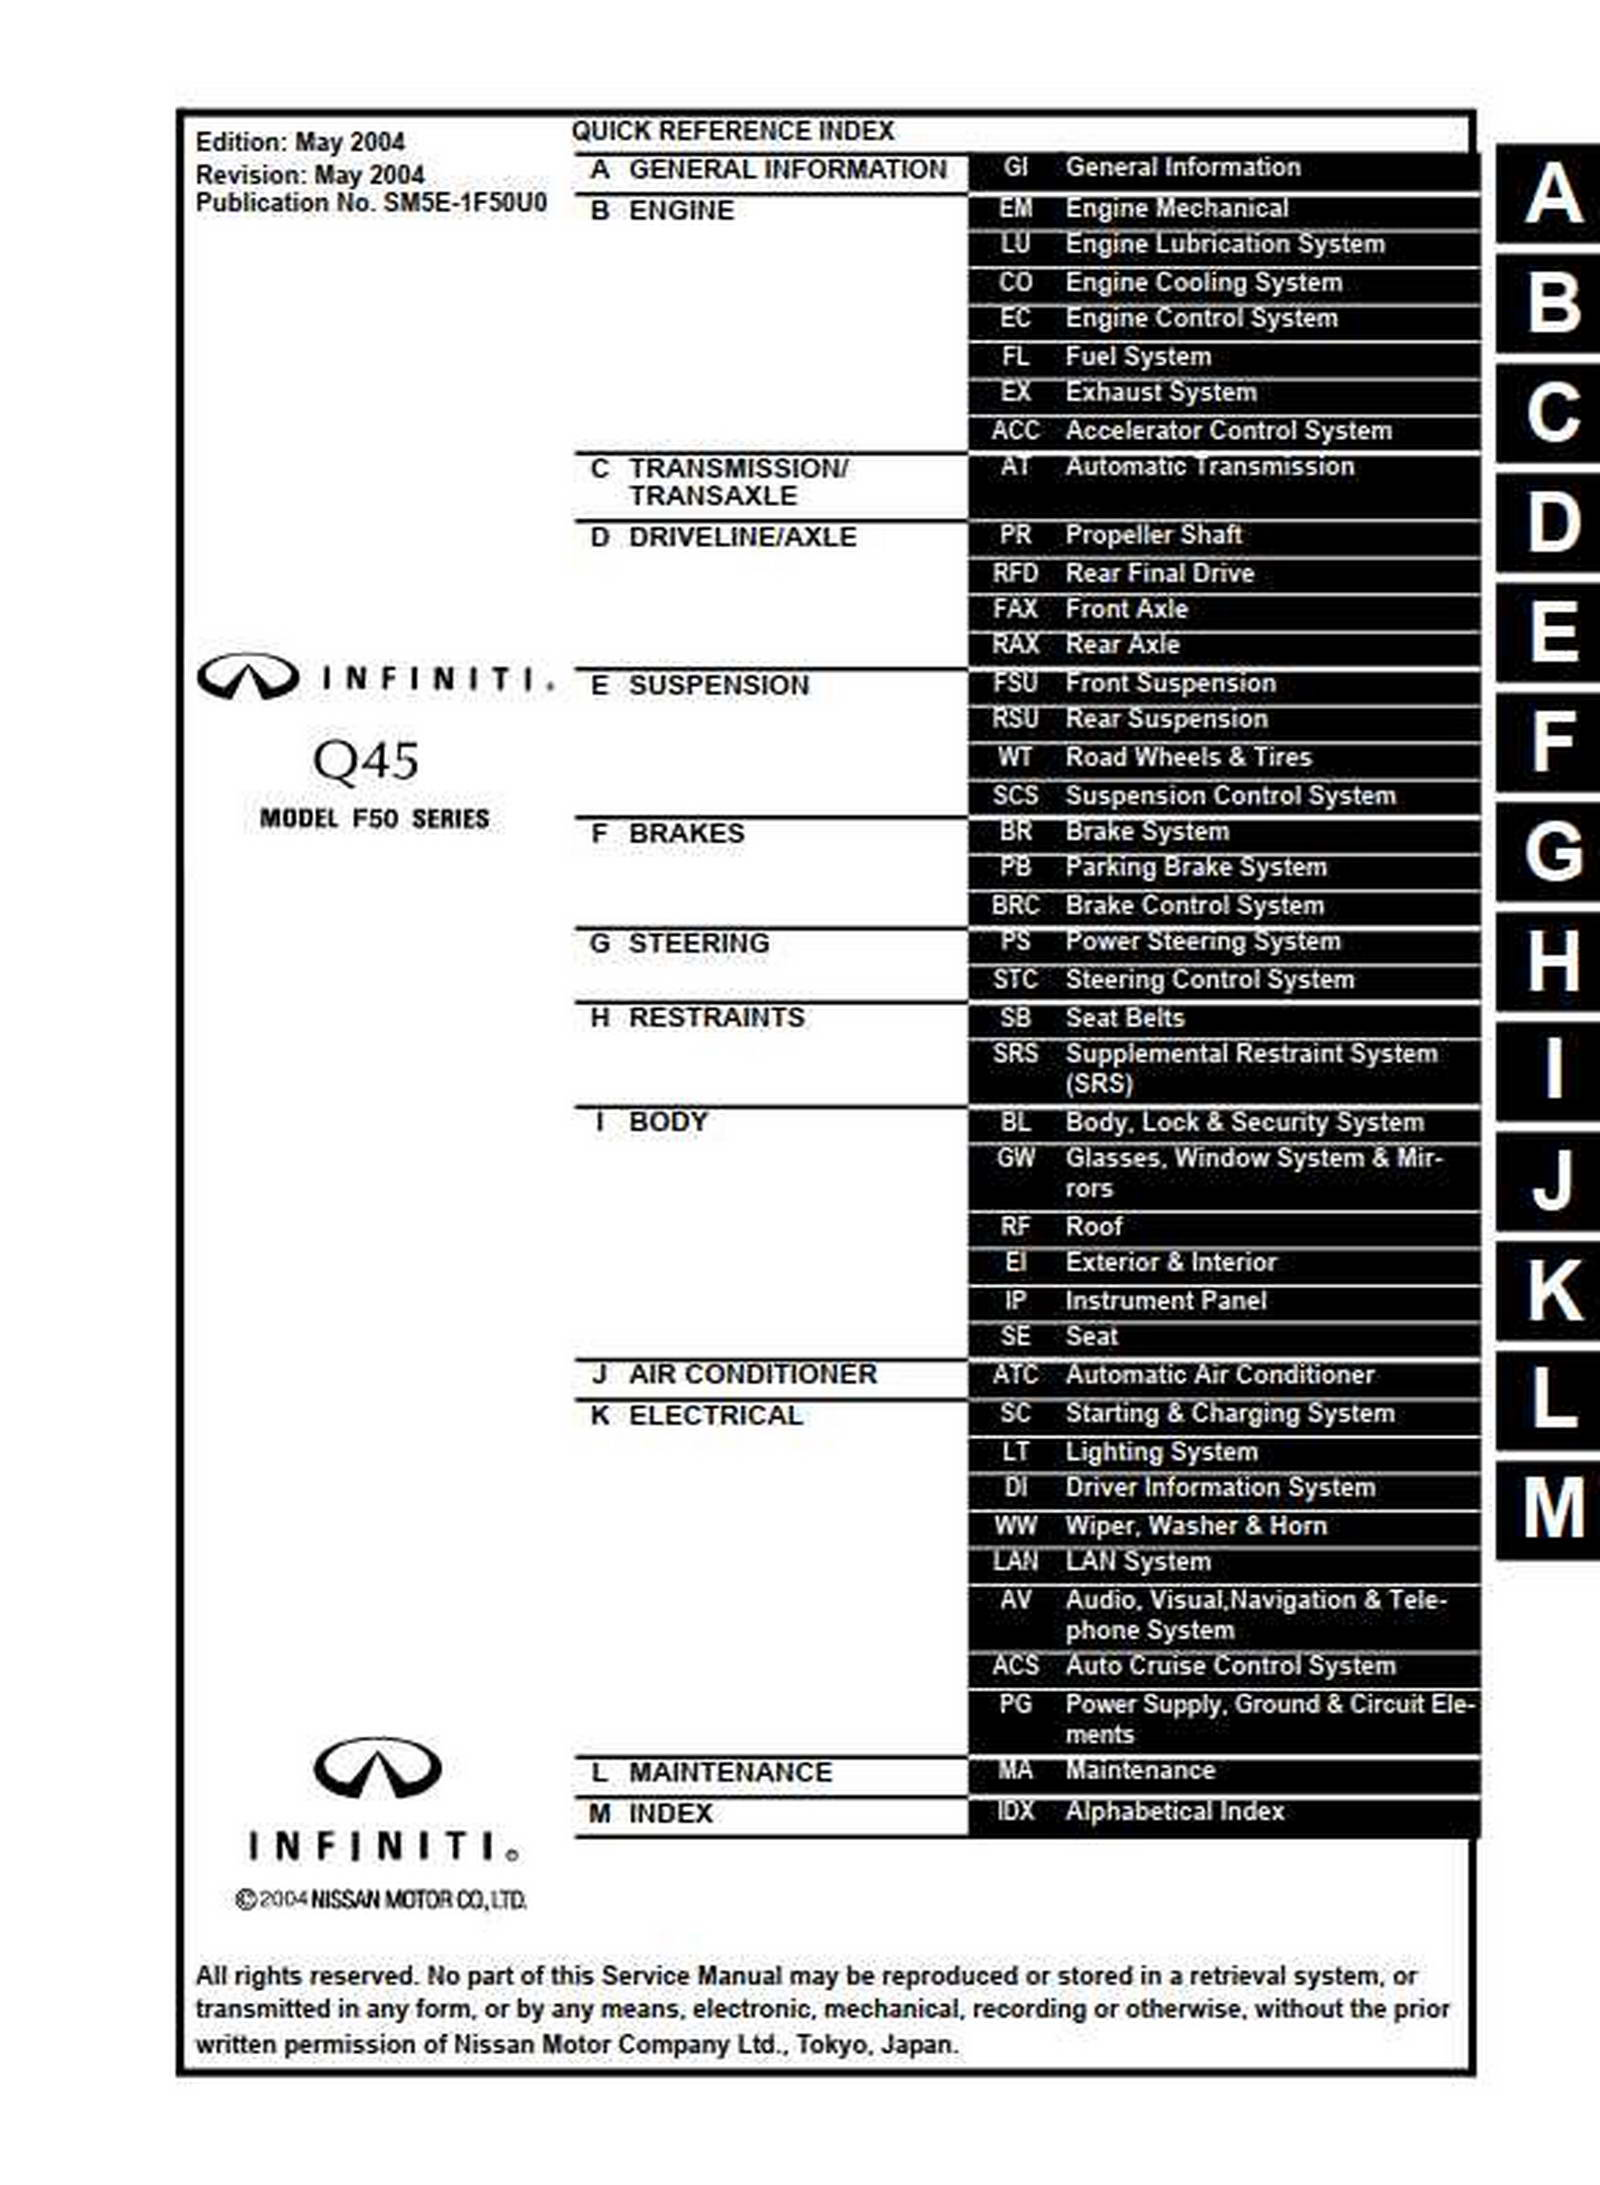 Infiniti Q45 Model F50 Series 2005 Service Manual